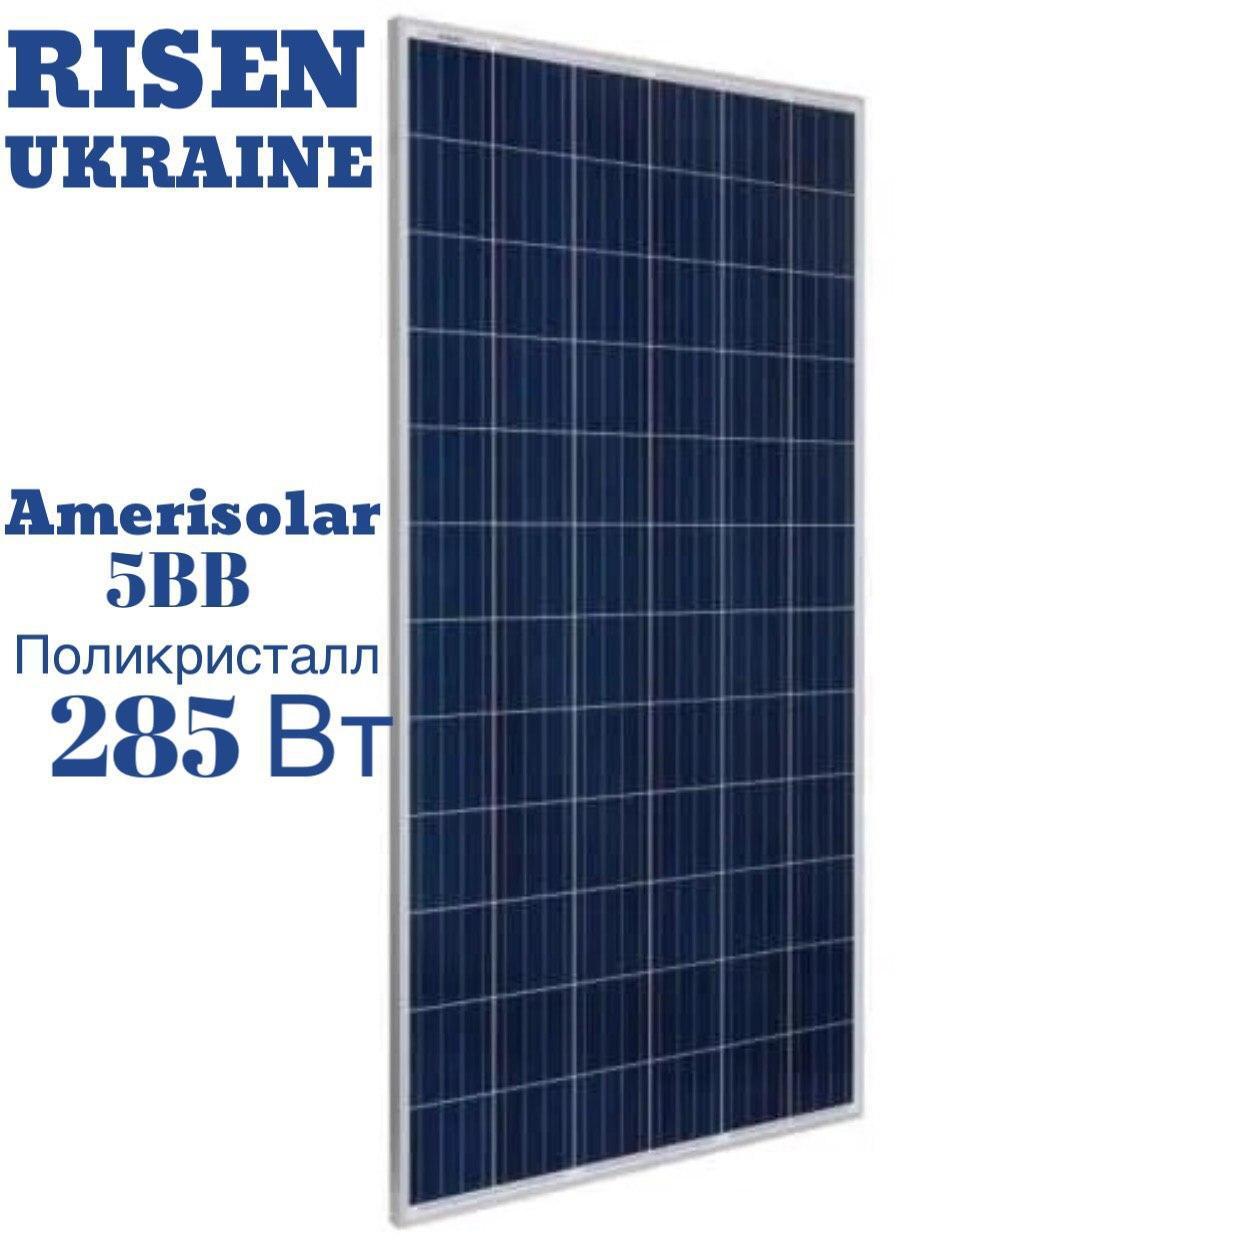 Солнечная батарея Amerisolar AS-6P30-285, 5bb, 285W, Poly